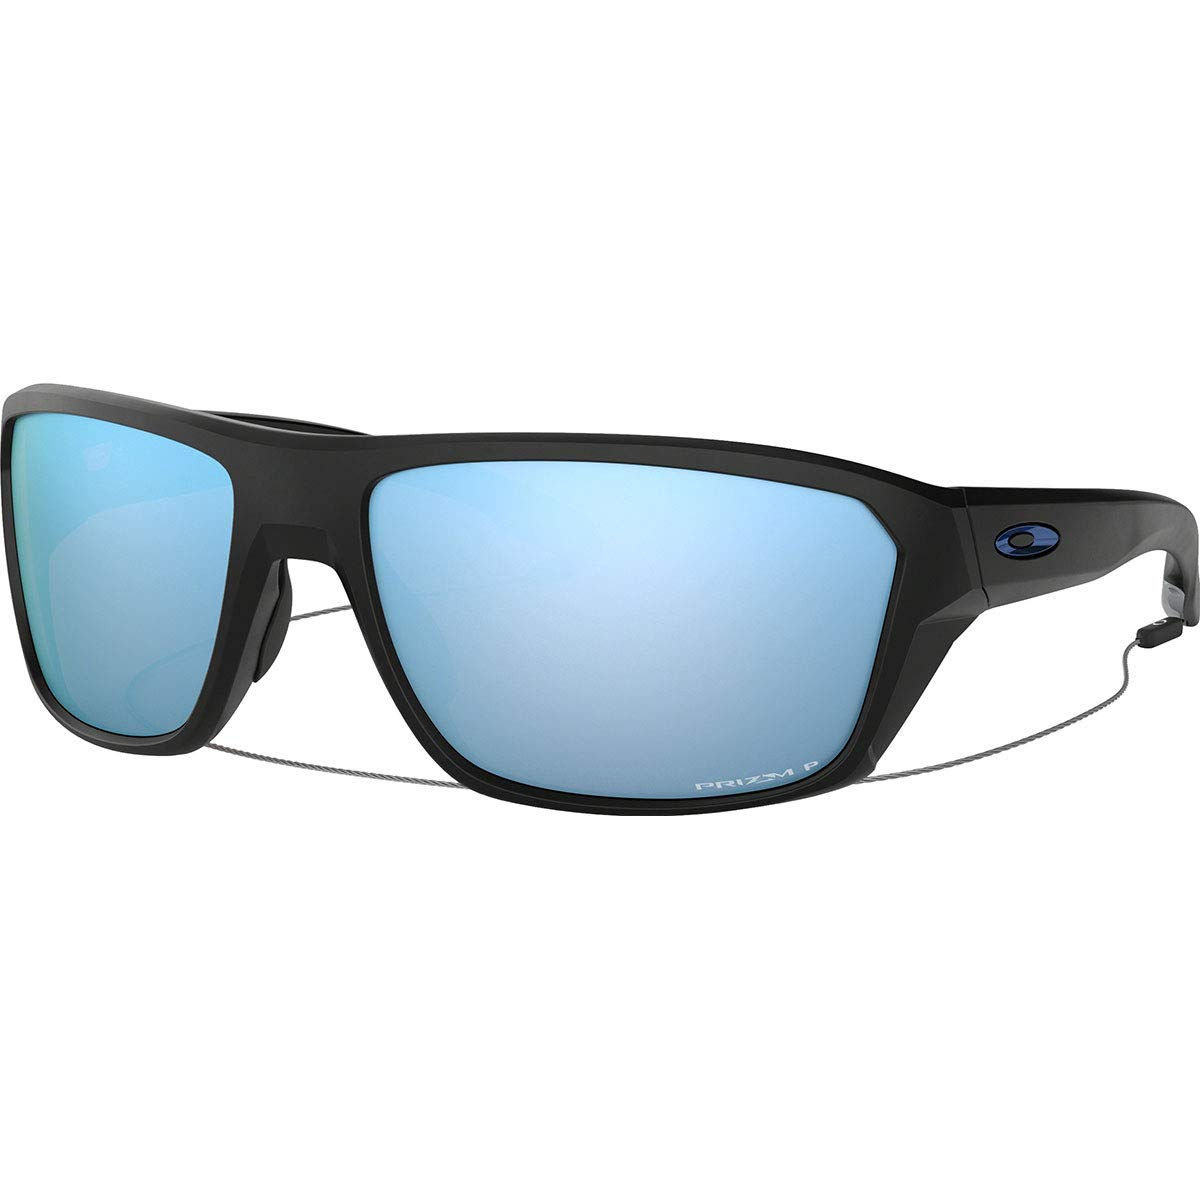 Oakley Men's OO9416 Split Shot Rectangular Sunglasses, Matte Black/Prizm Deep H2O Polarized, 64 mm by Oakley